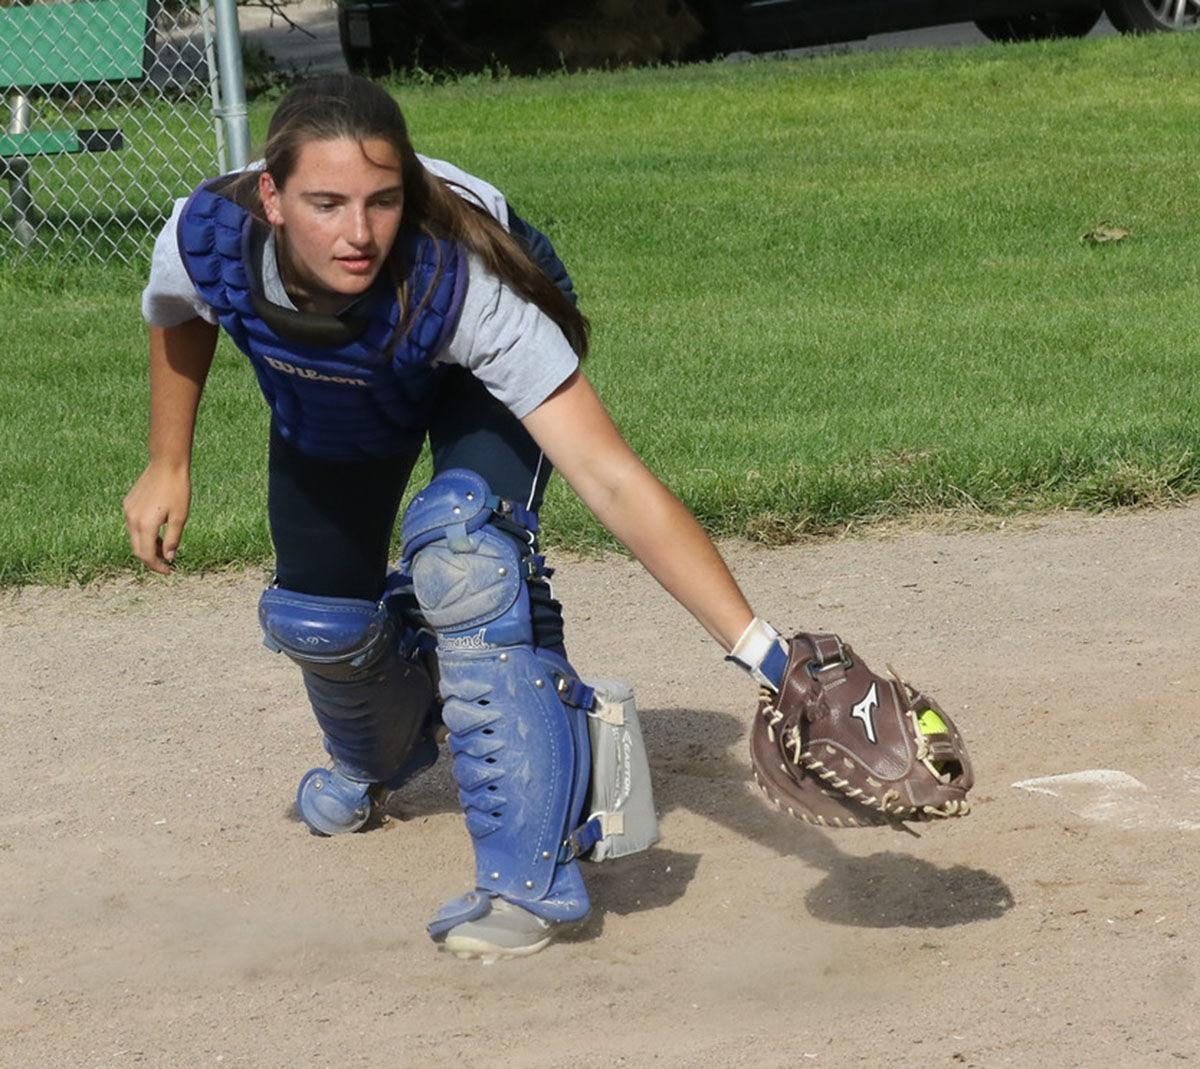 Photos: Gering Softball Practice 8-20